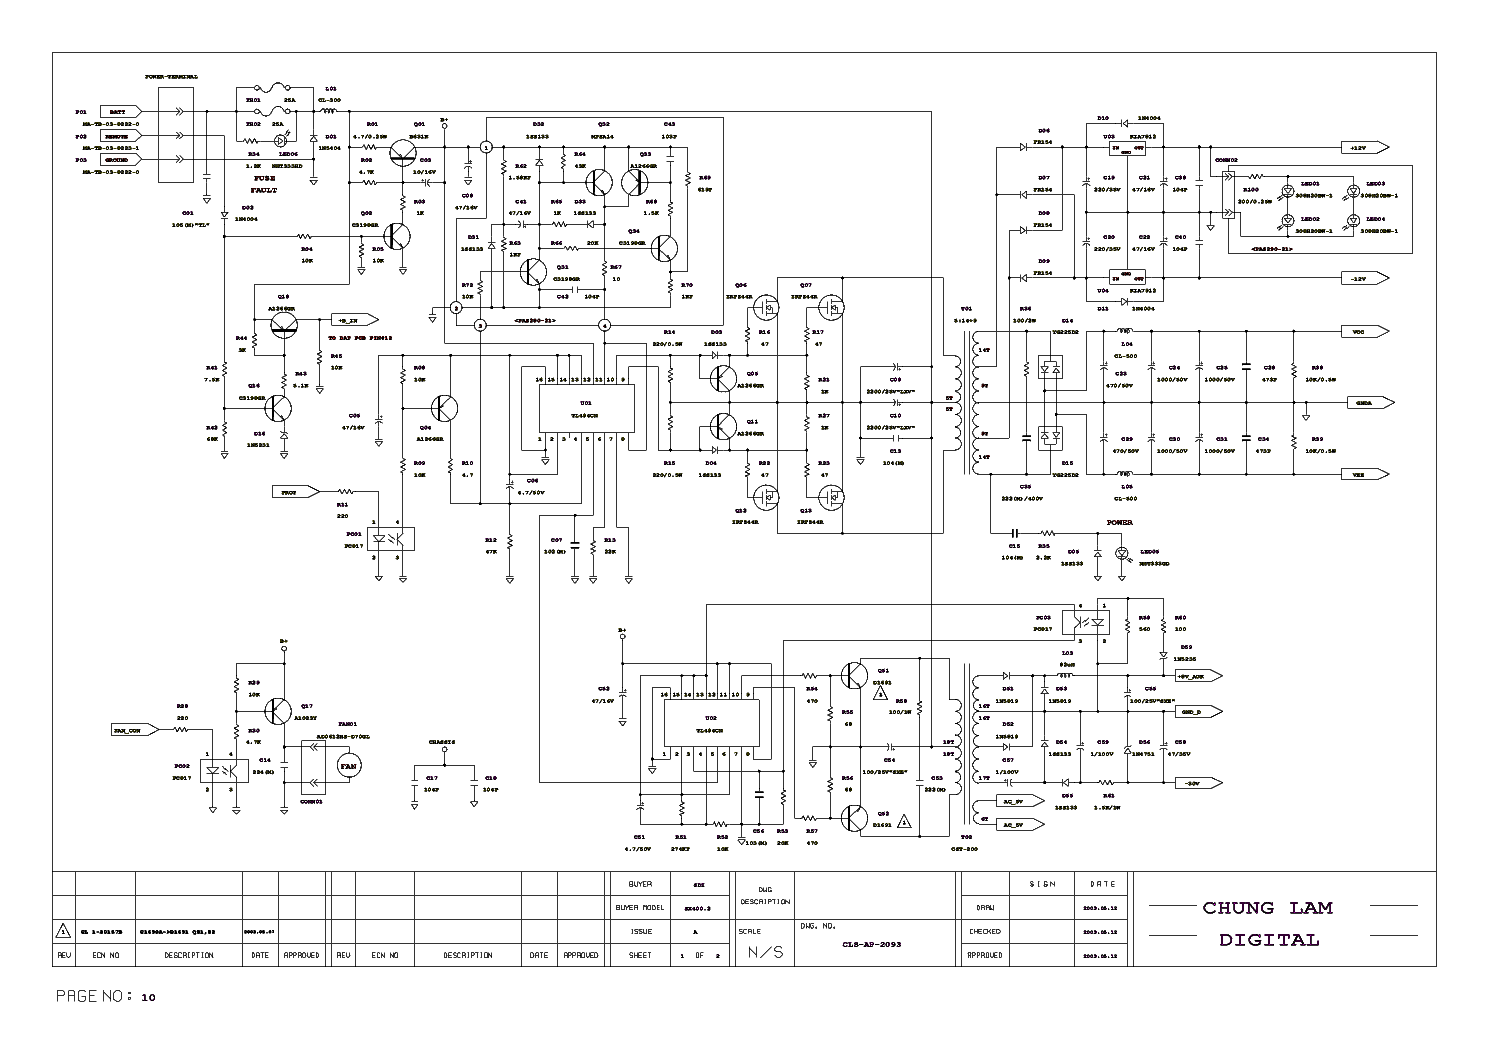 Kicker Kx12001 Sch Car Power Amplifier Service Manual Download Stereo Lifier Wiring Diagram